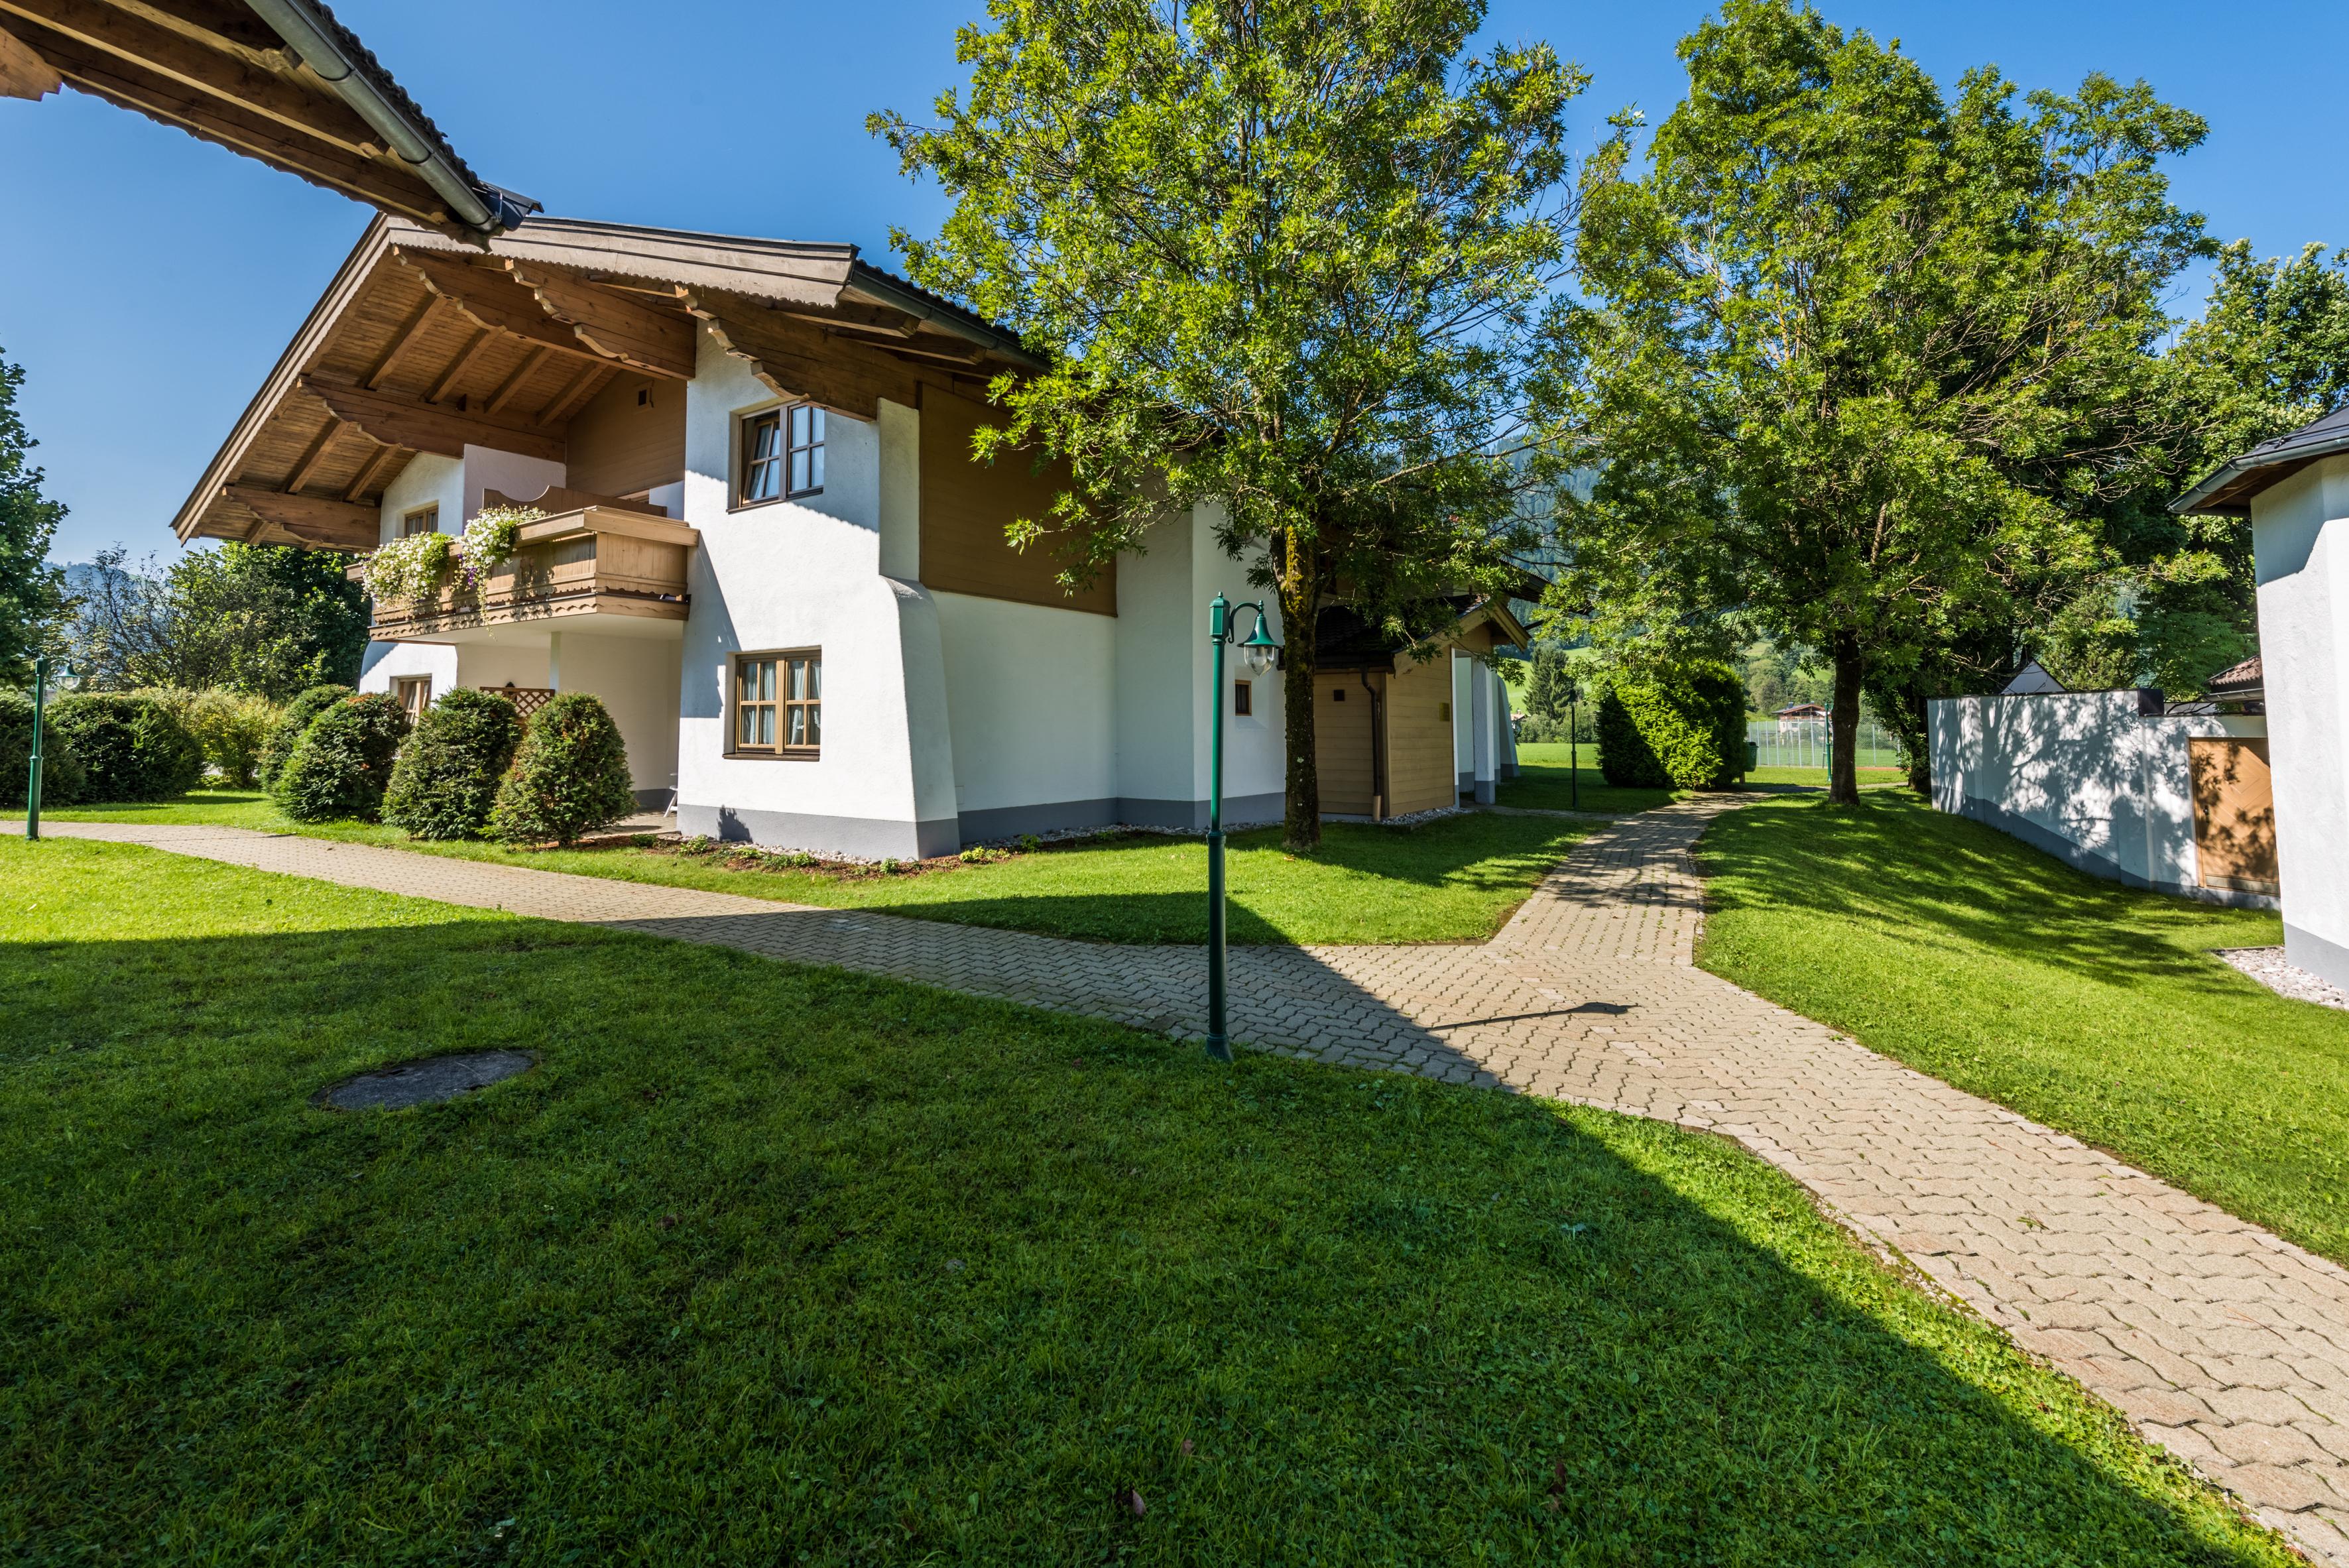 Cordial Golf & Wellness Hotel Reith bei Kitzbühel, Kitzbühel